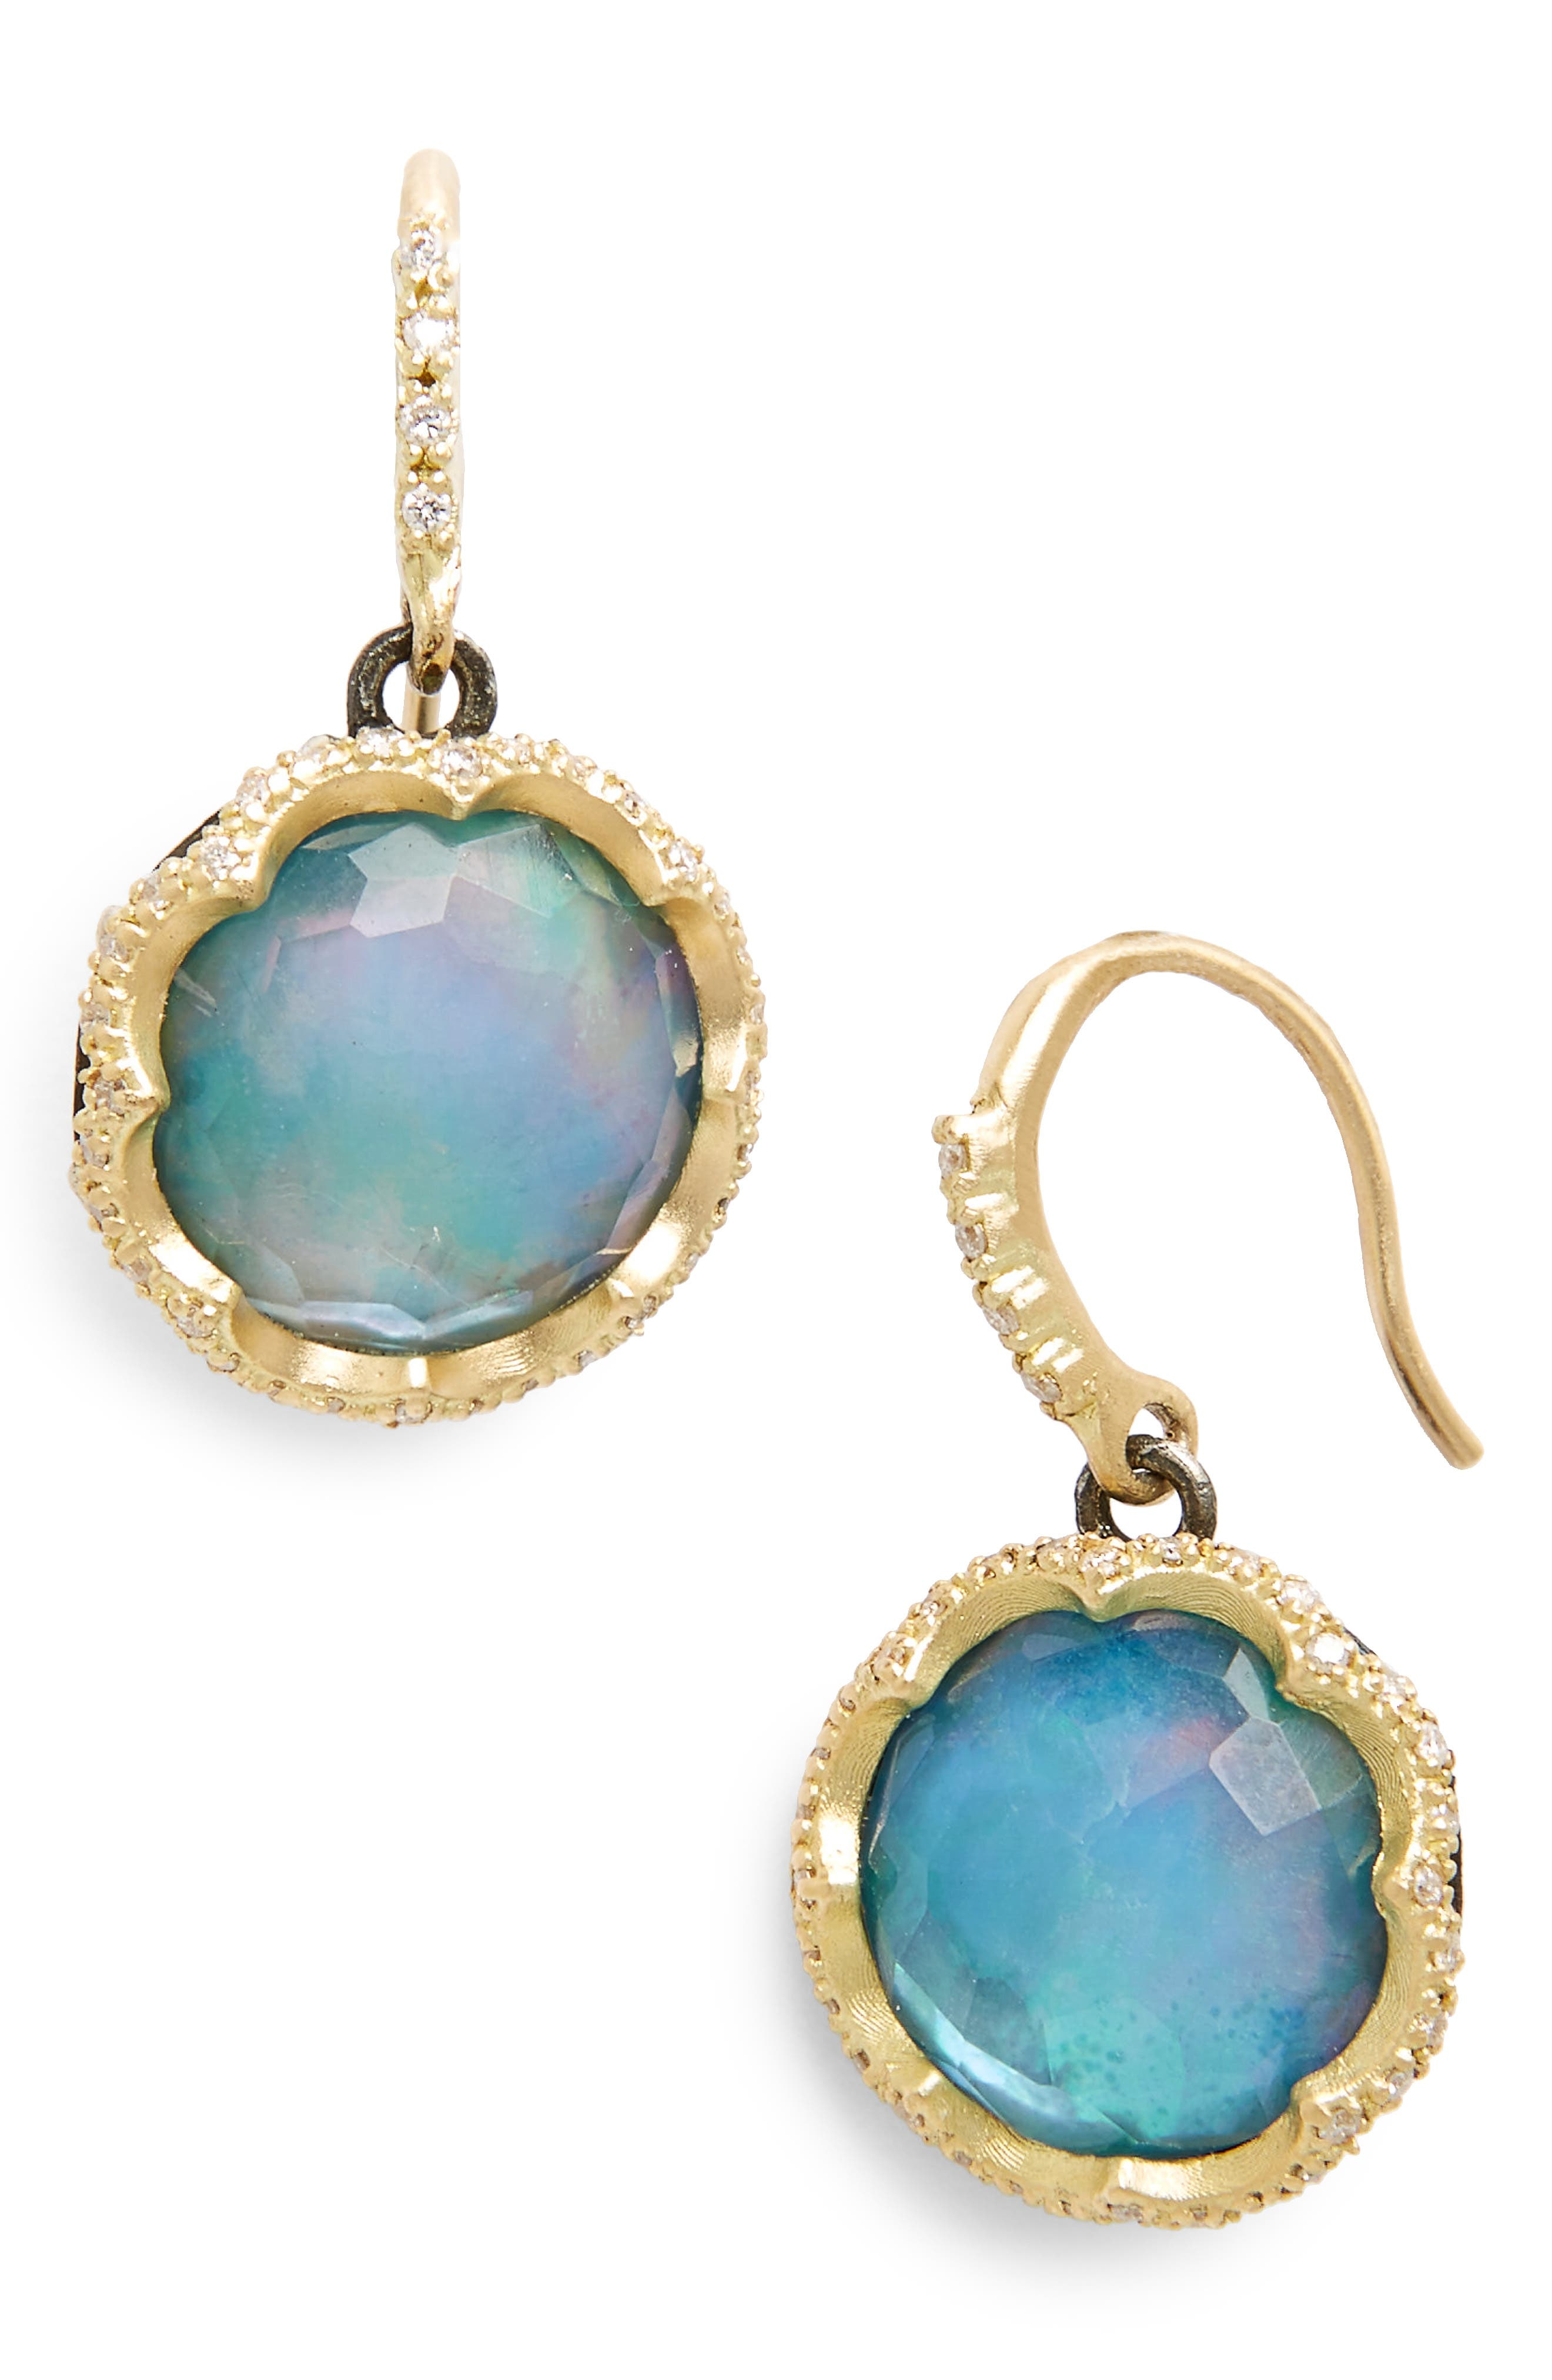 Old World Opal Drop Earrings,                             Main thumbnail 1, color,                             710